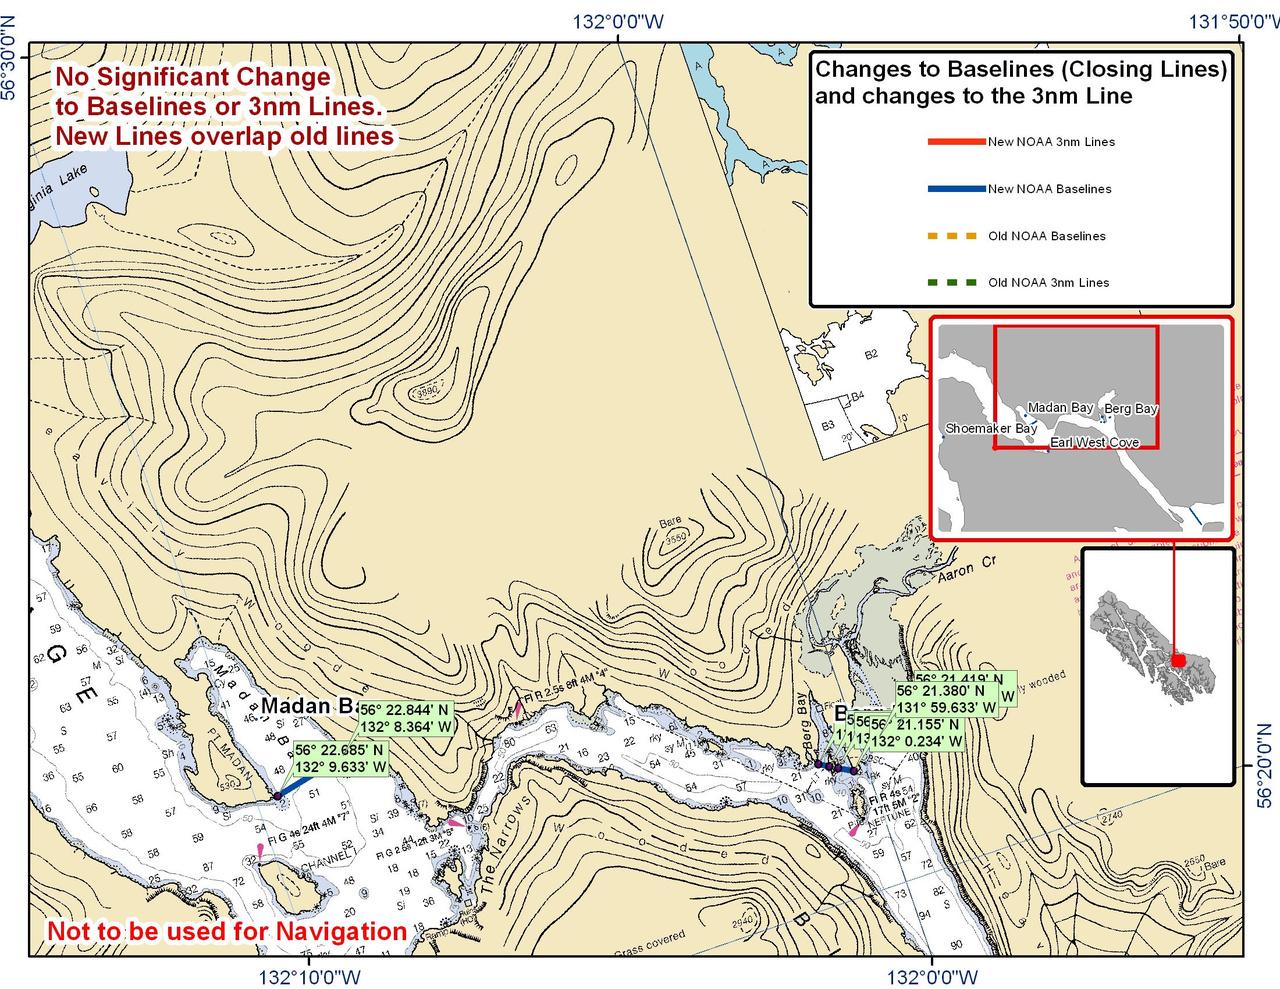 Chart for Madan and Berg Bay